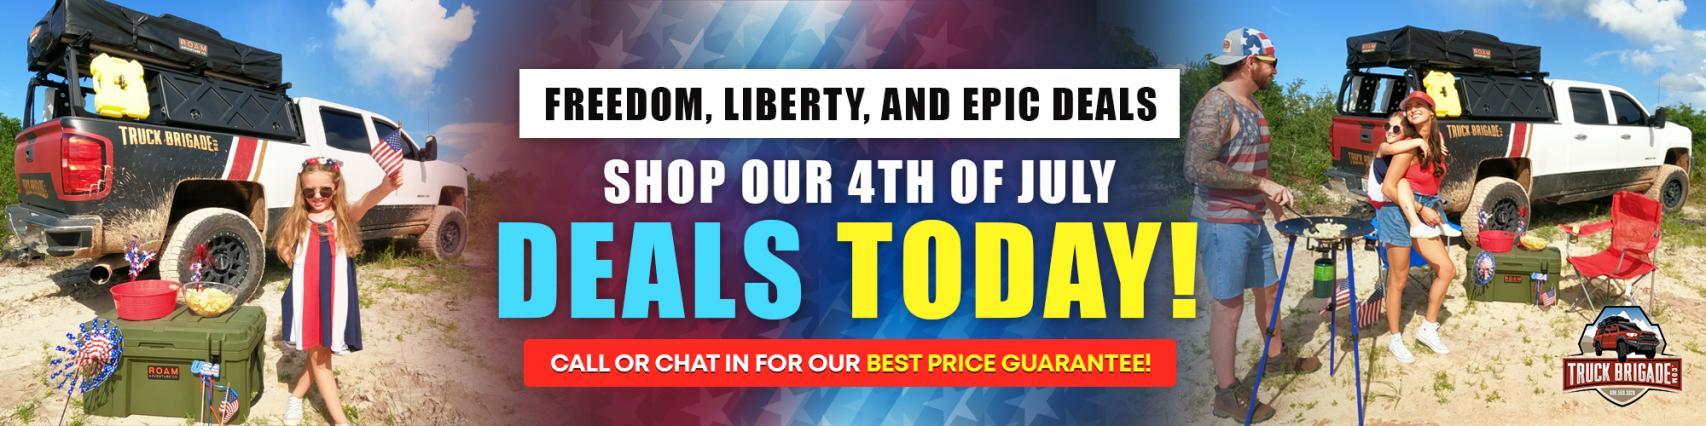 Fourth of July Savings Event-prerunnerryan-2000-500-346335333543-jpg